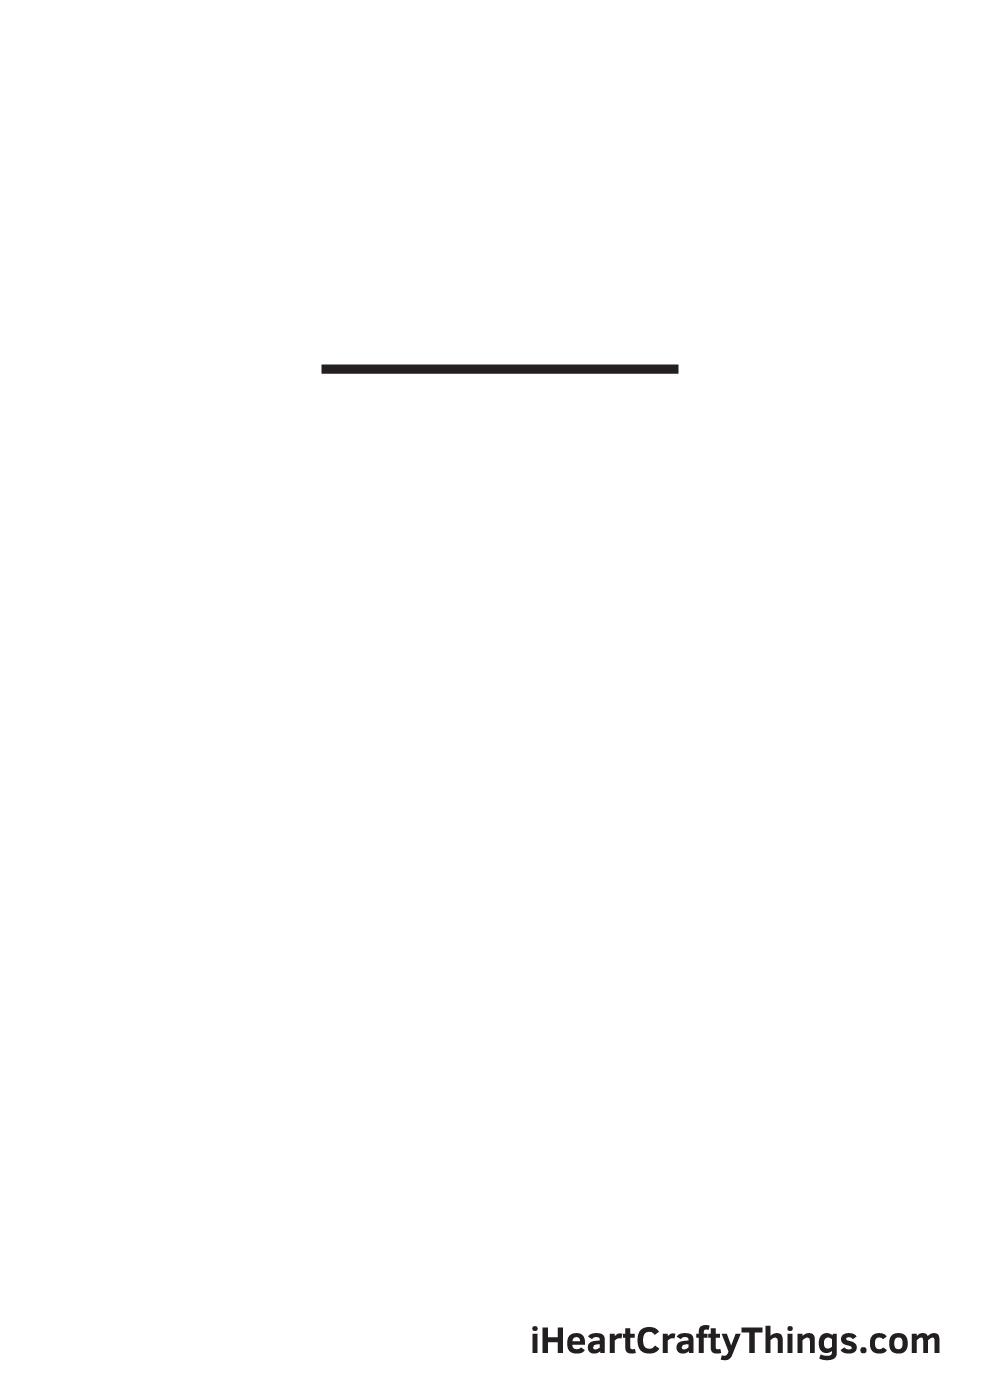 hexagon drawing step 1